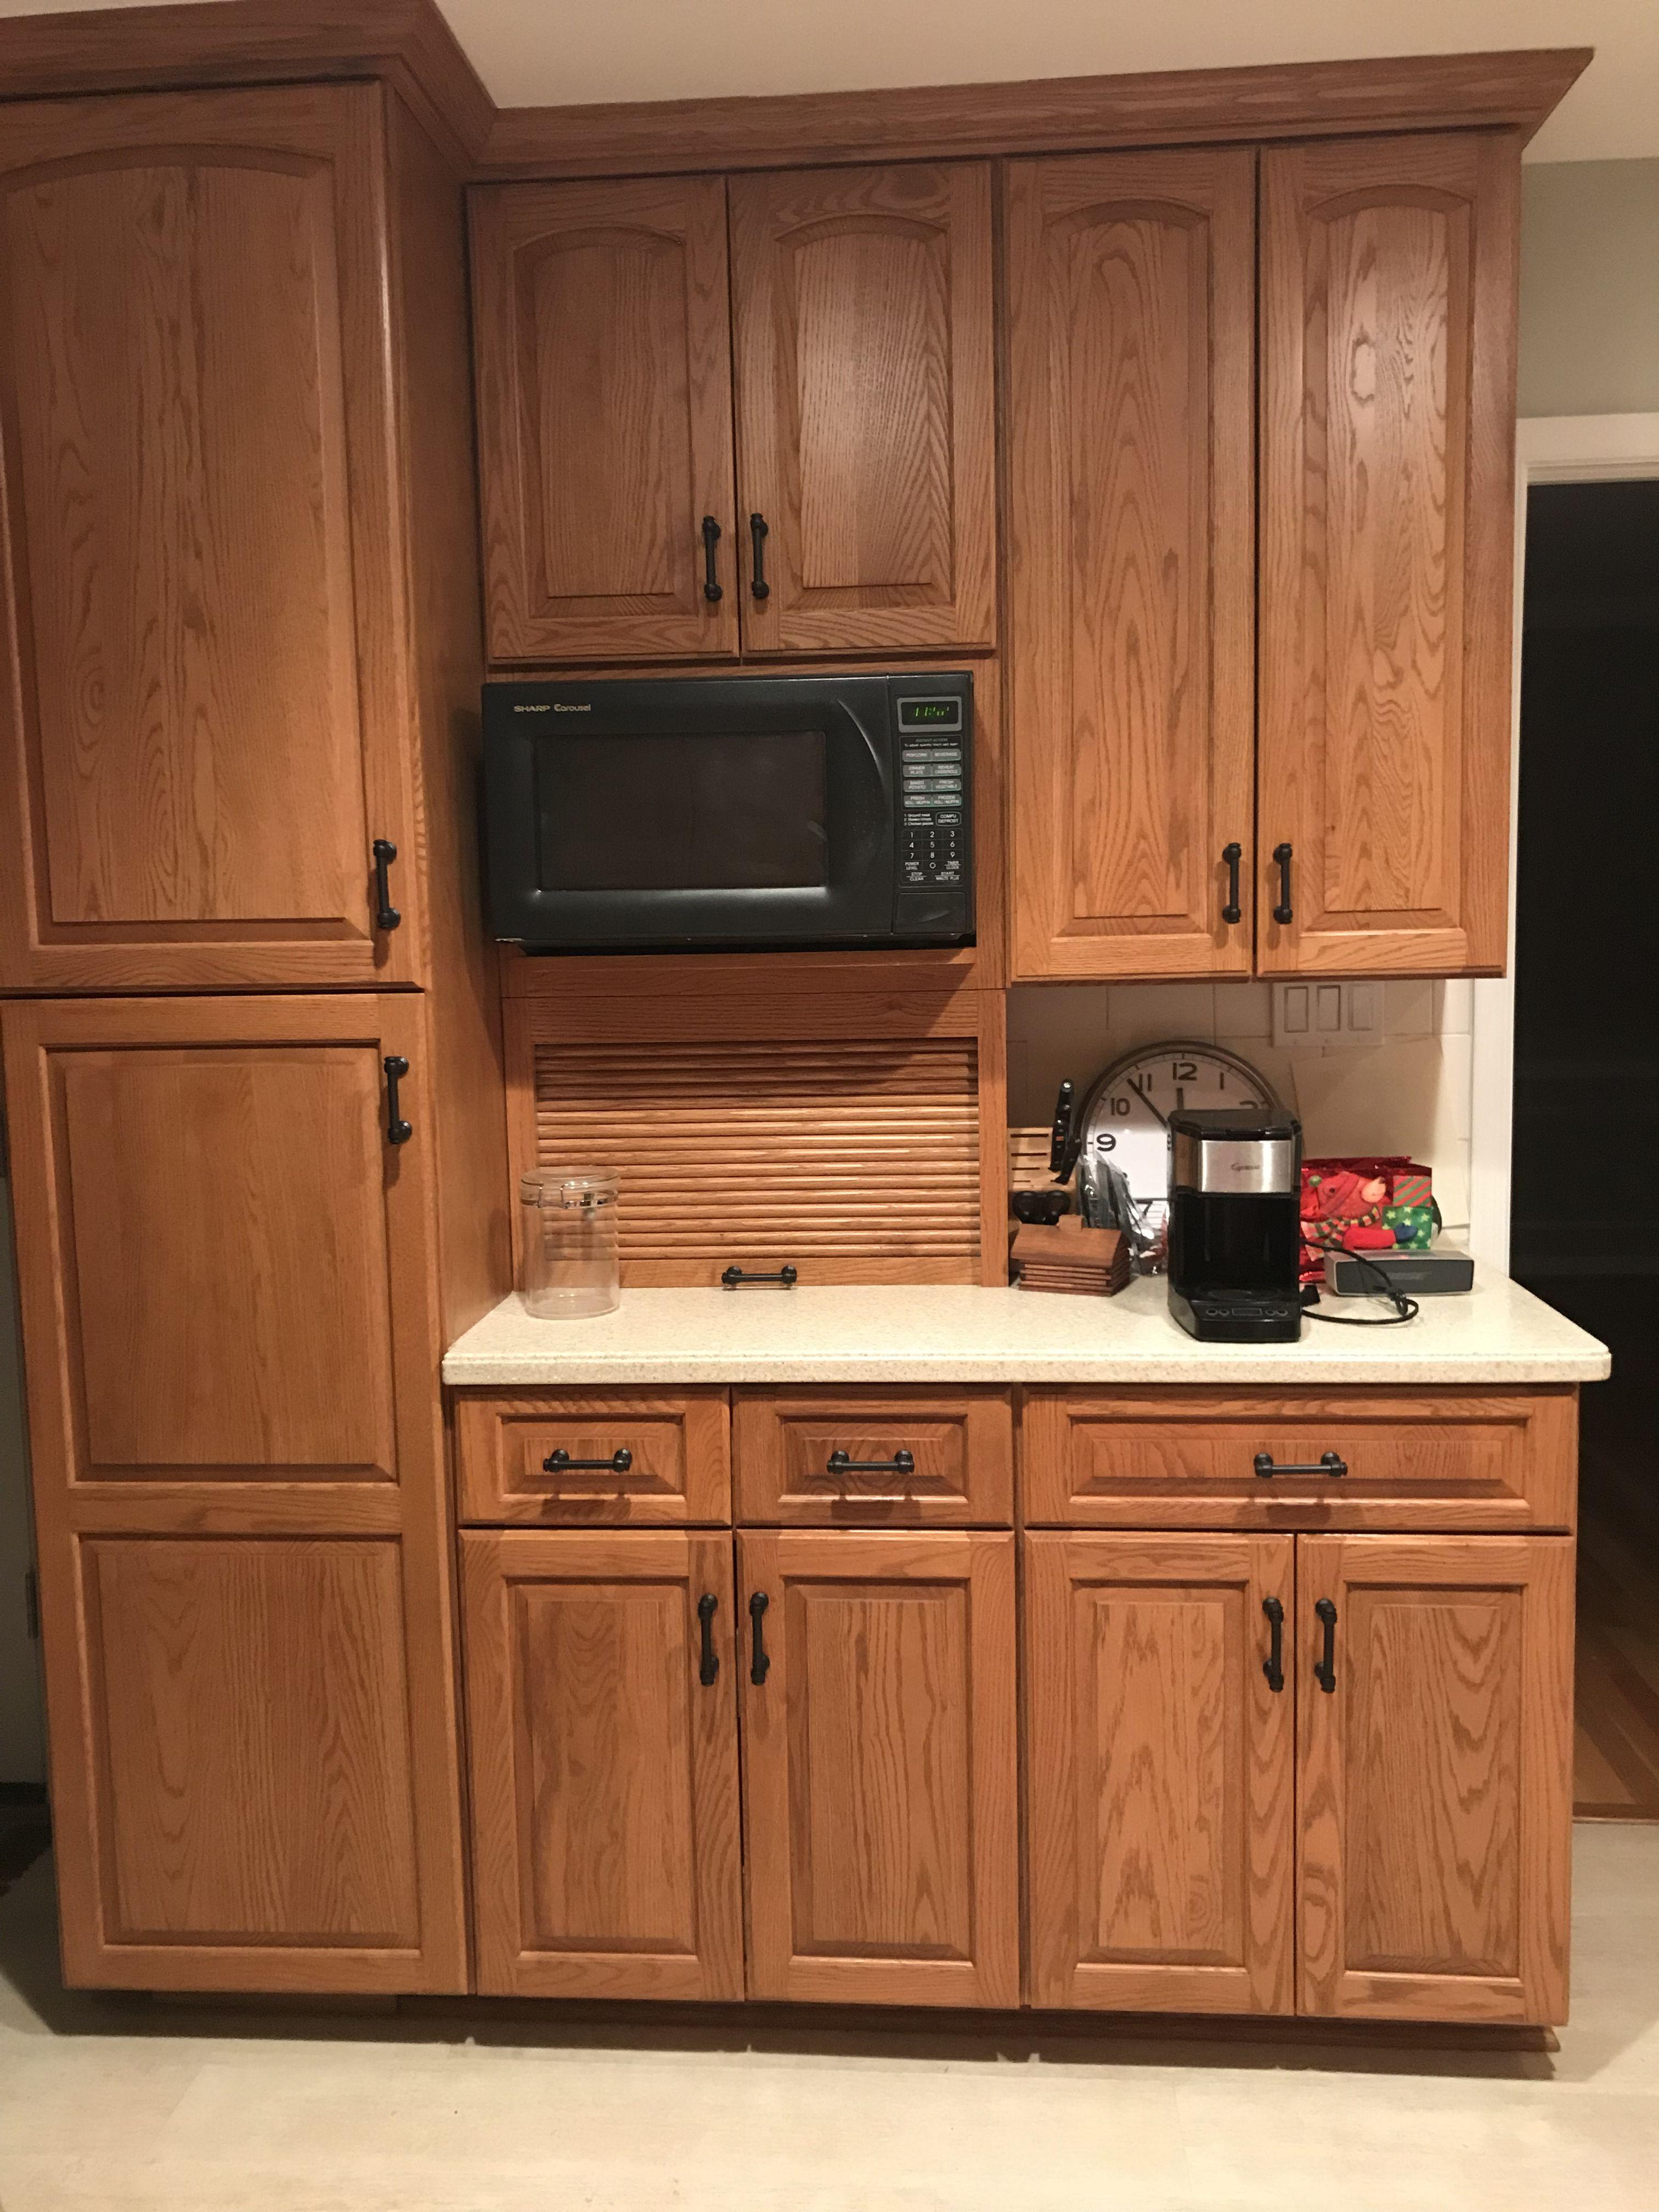 Oak Cabinets With Rh Lugarno Pulls Kitchen Design Interior Design Kitchen Oak Cabinets